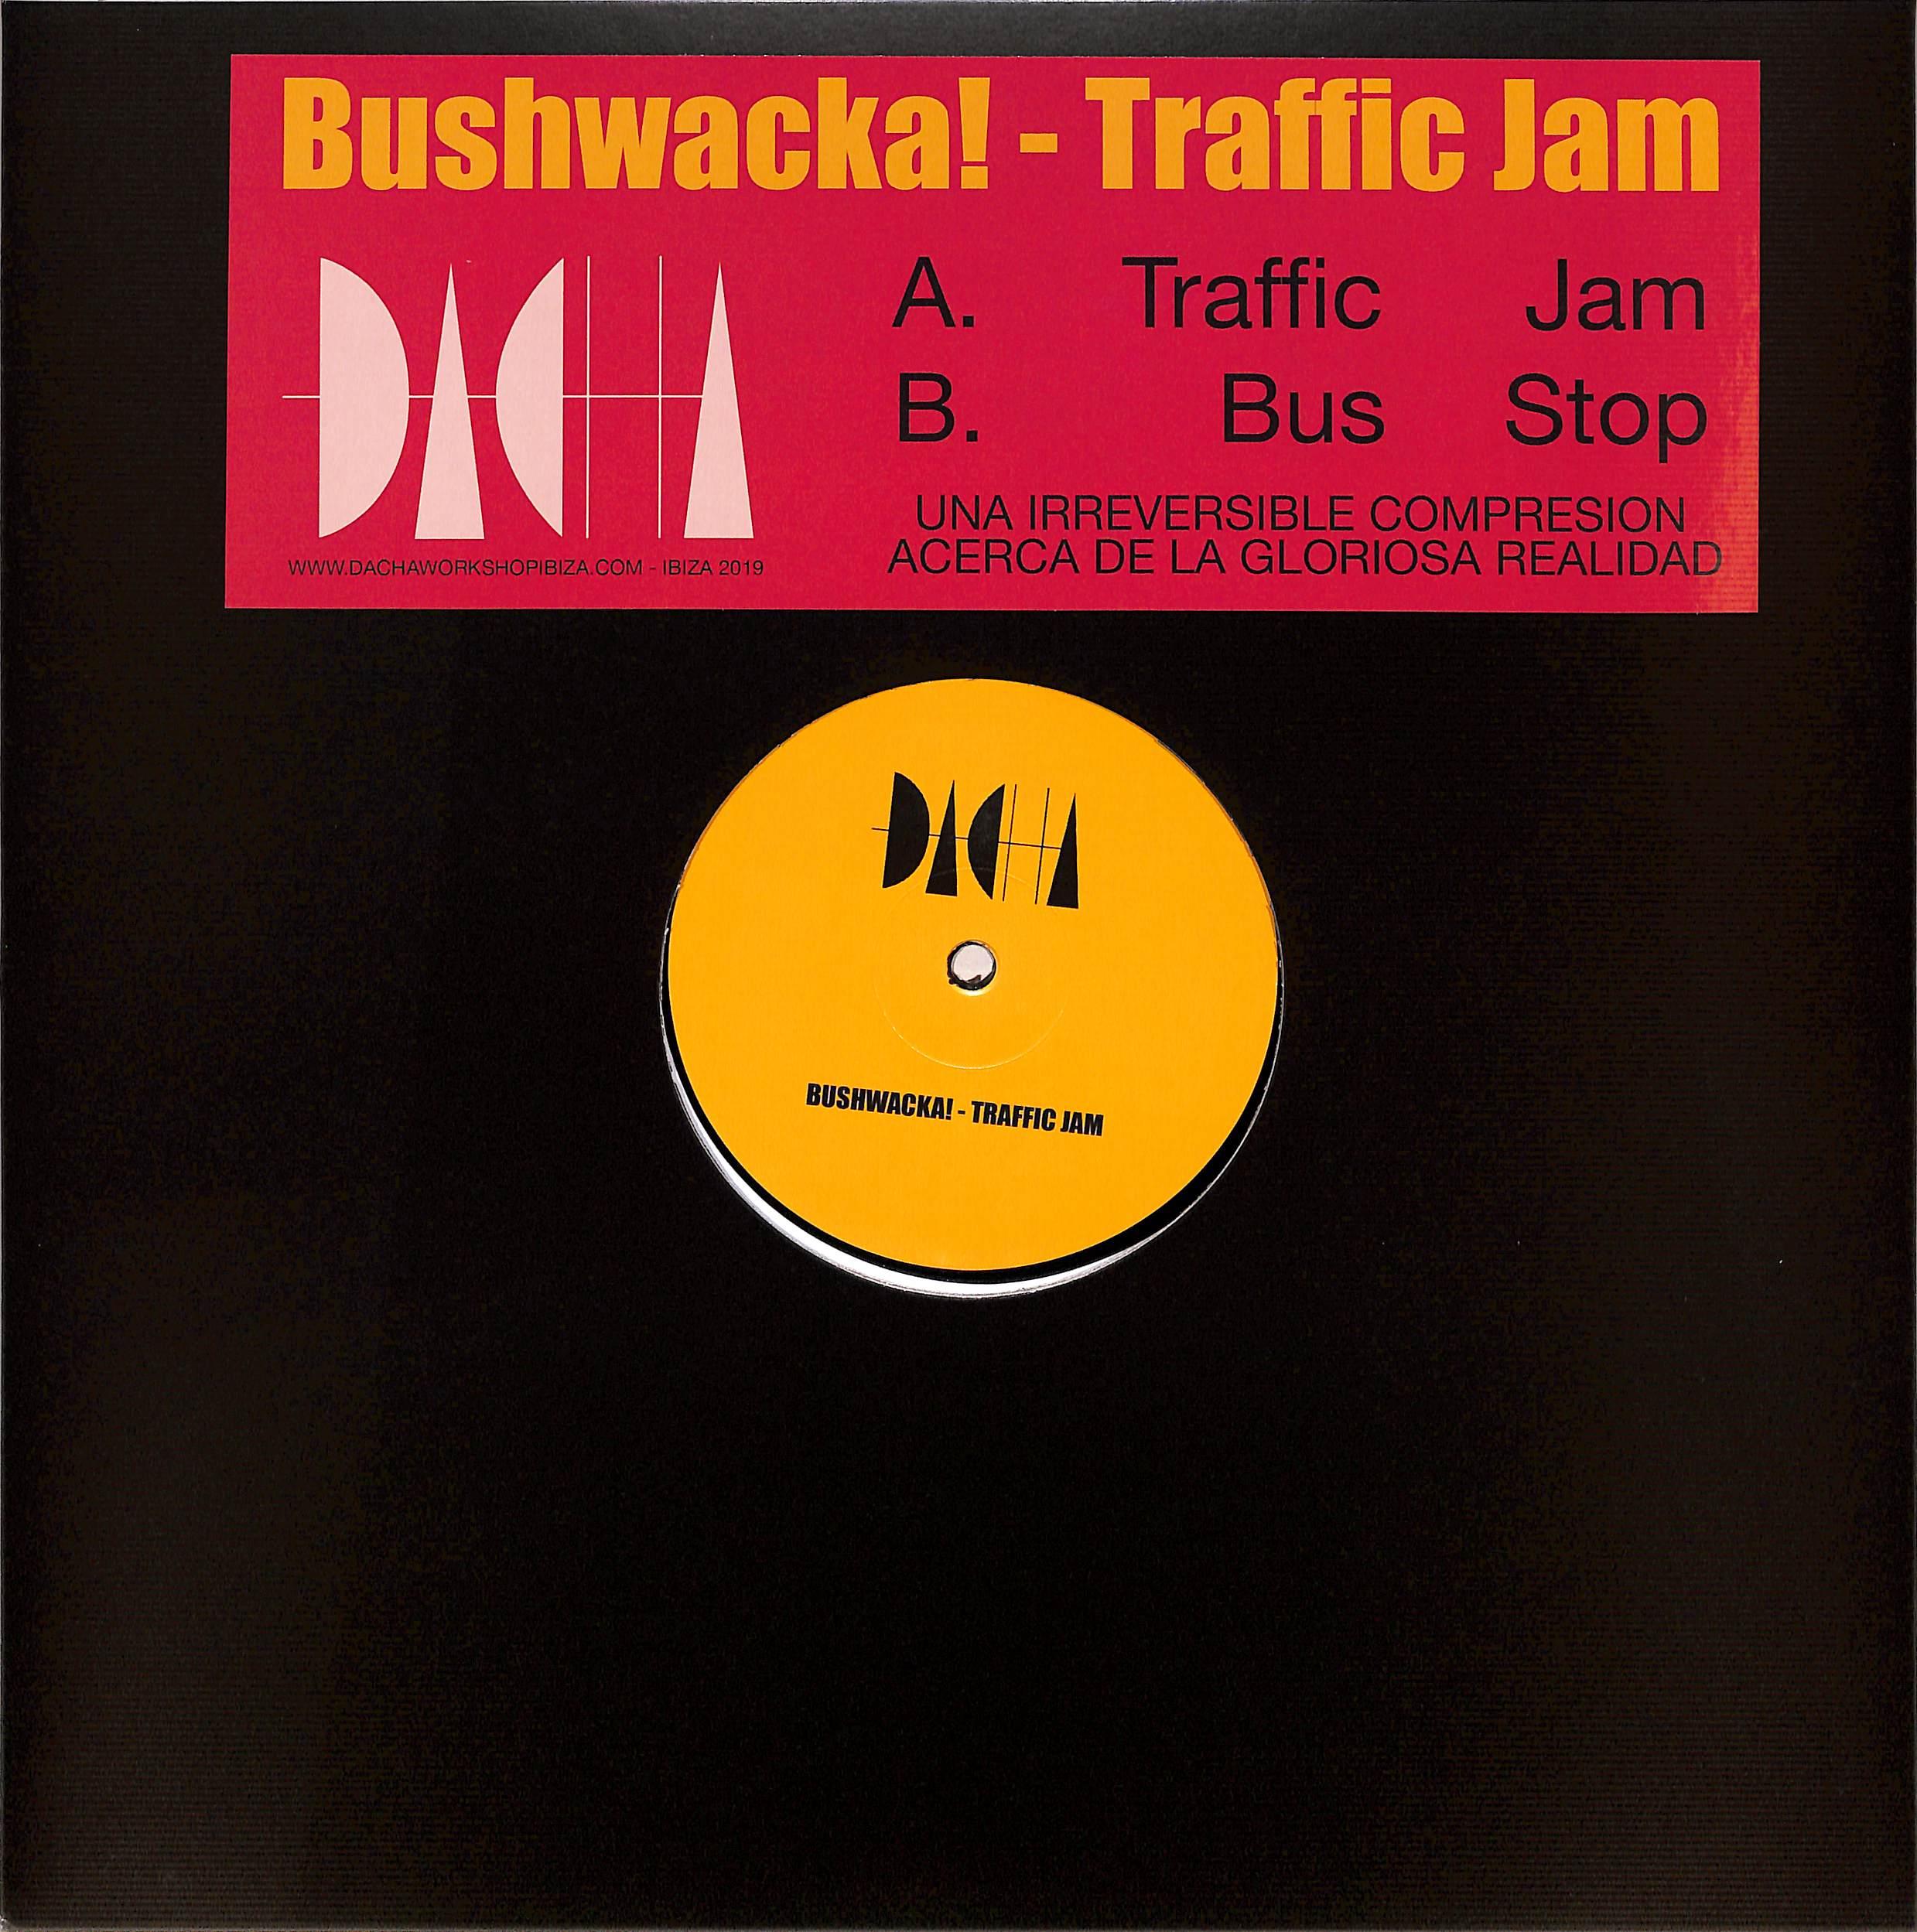 Bushwacka! - TRAFFIC JAM